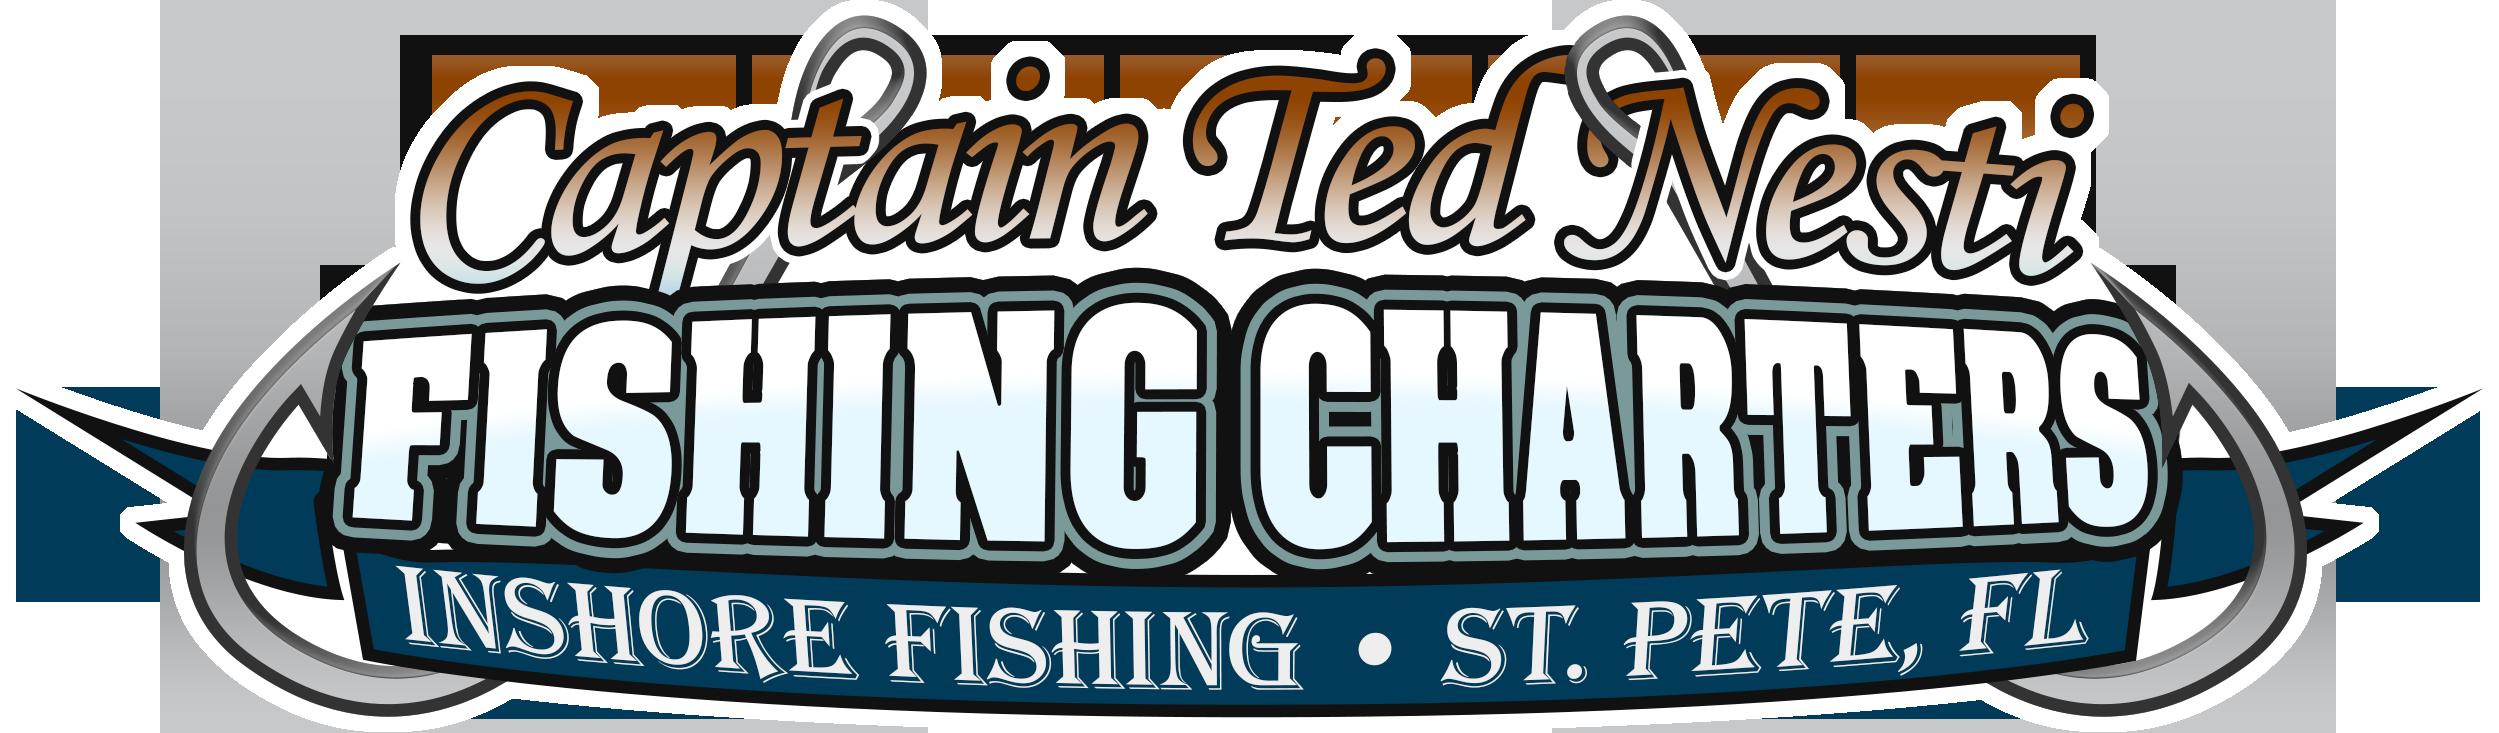 Captain Ted Nesti Fishing Charters